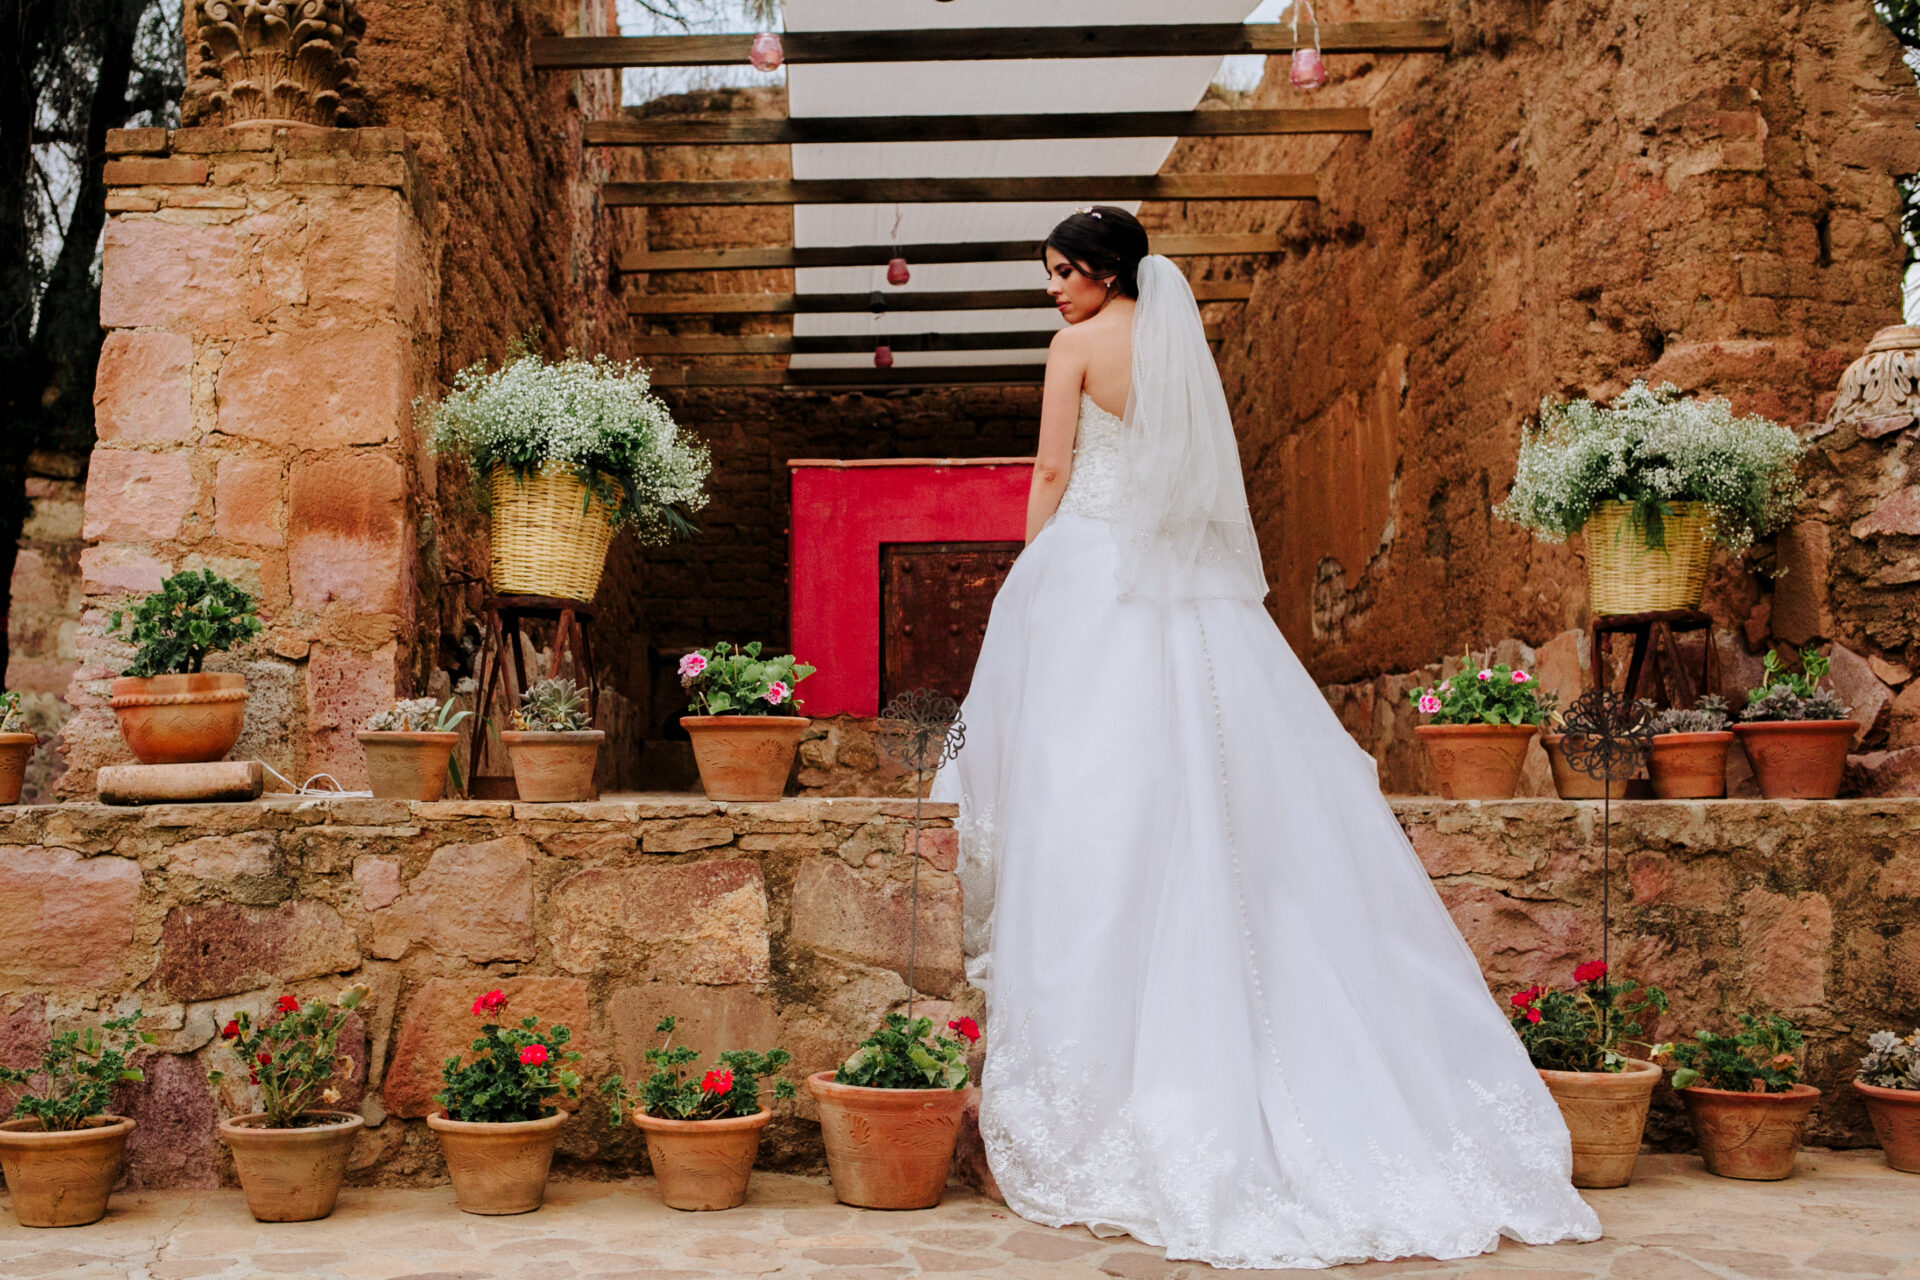 javier_noriega_fotografo_bodas_exhacienda_las_mercedes_zacatecas_wedding_photographer23a